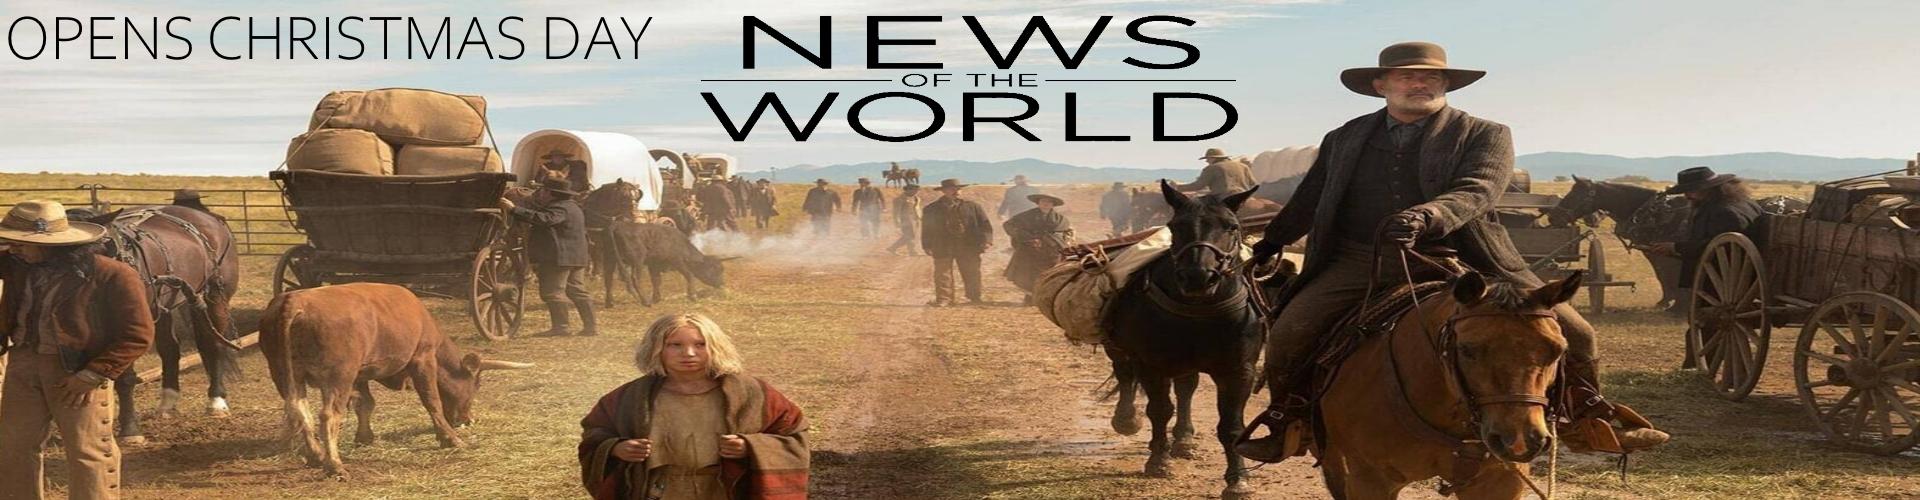 newsoftheworldbanner